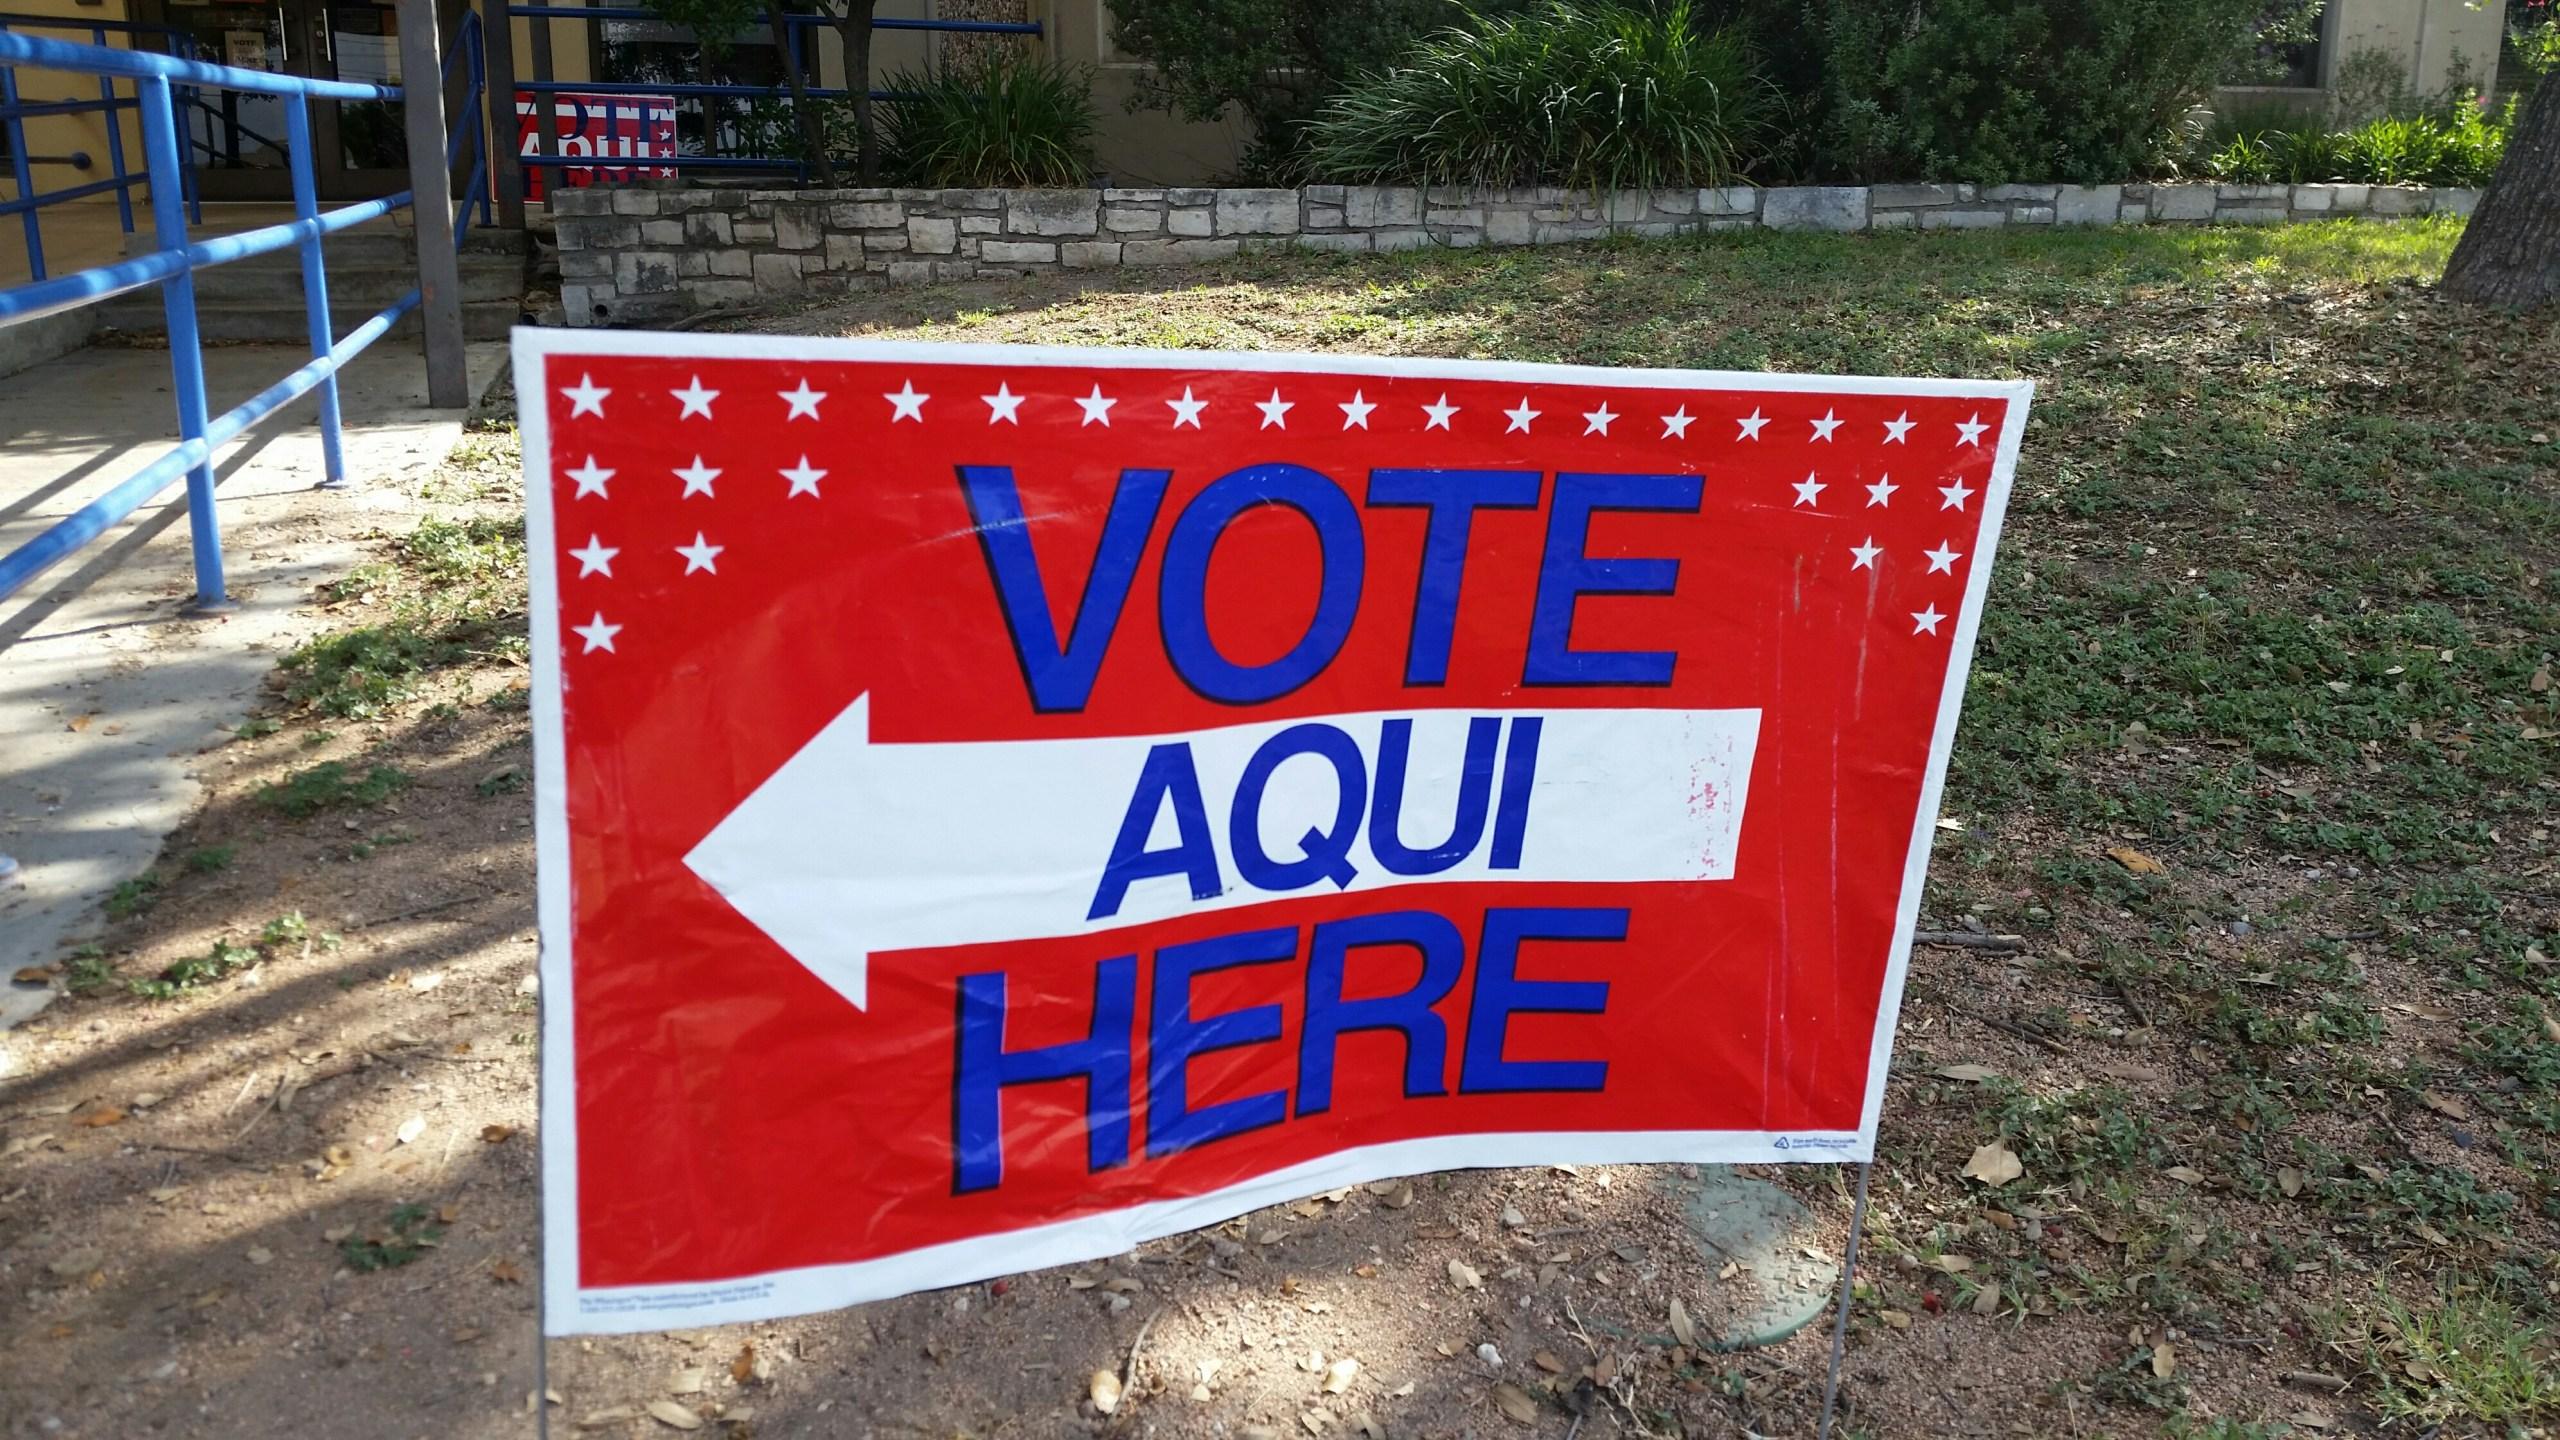 Vote Here sign - Voting - Voter